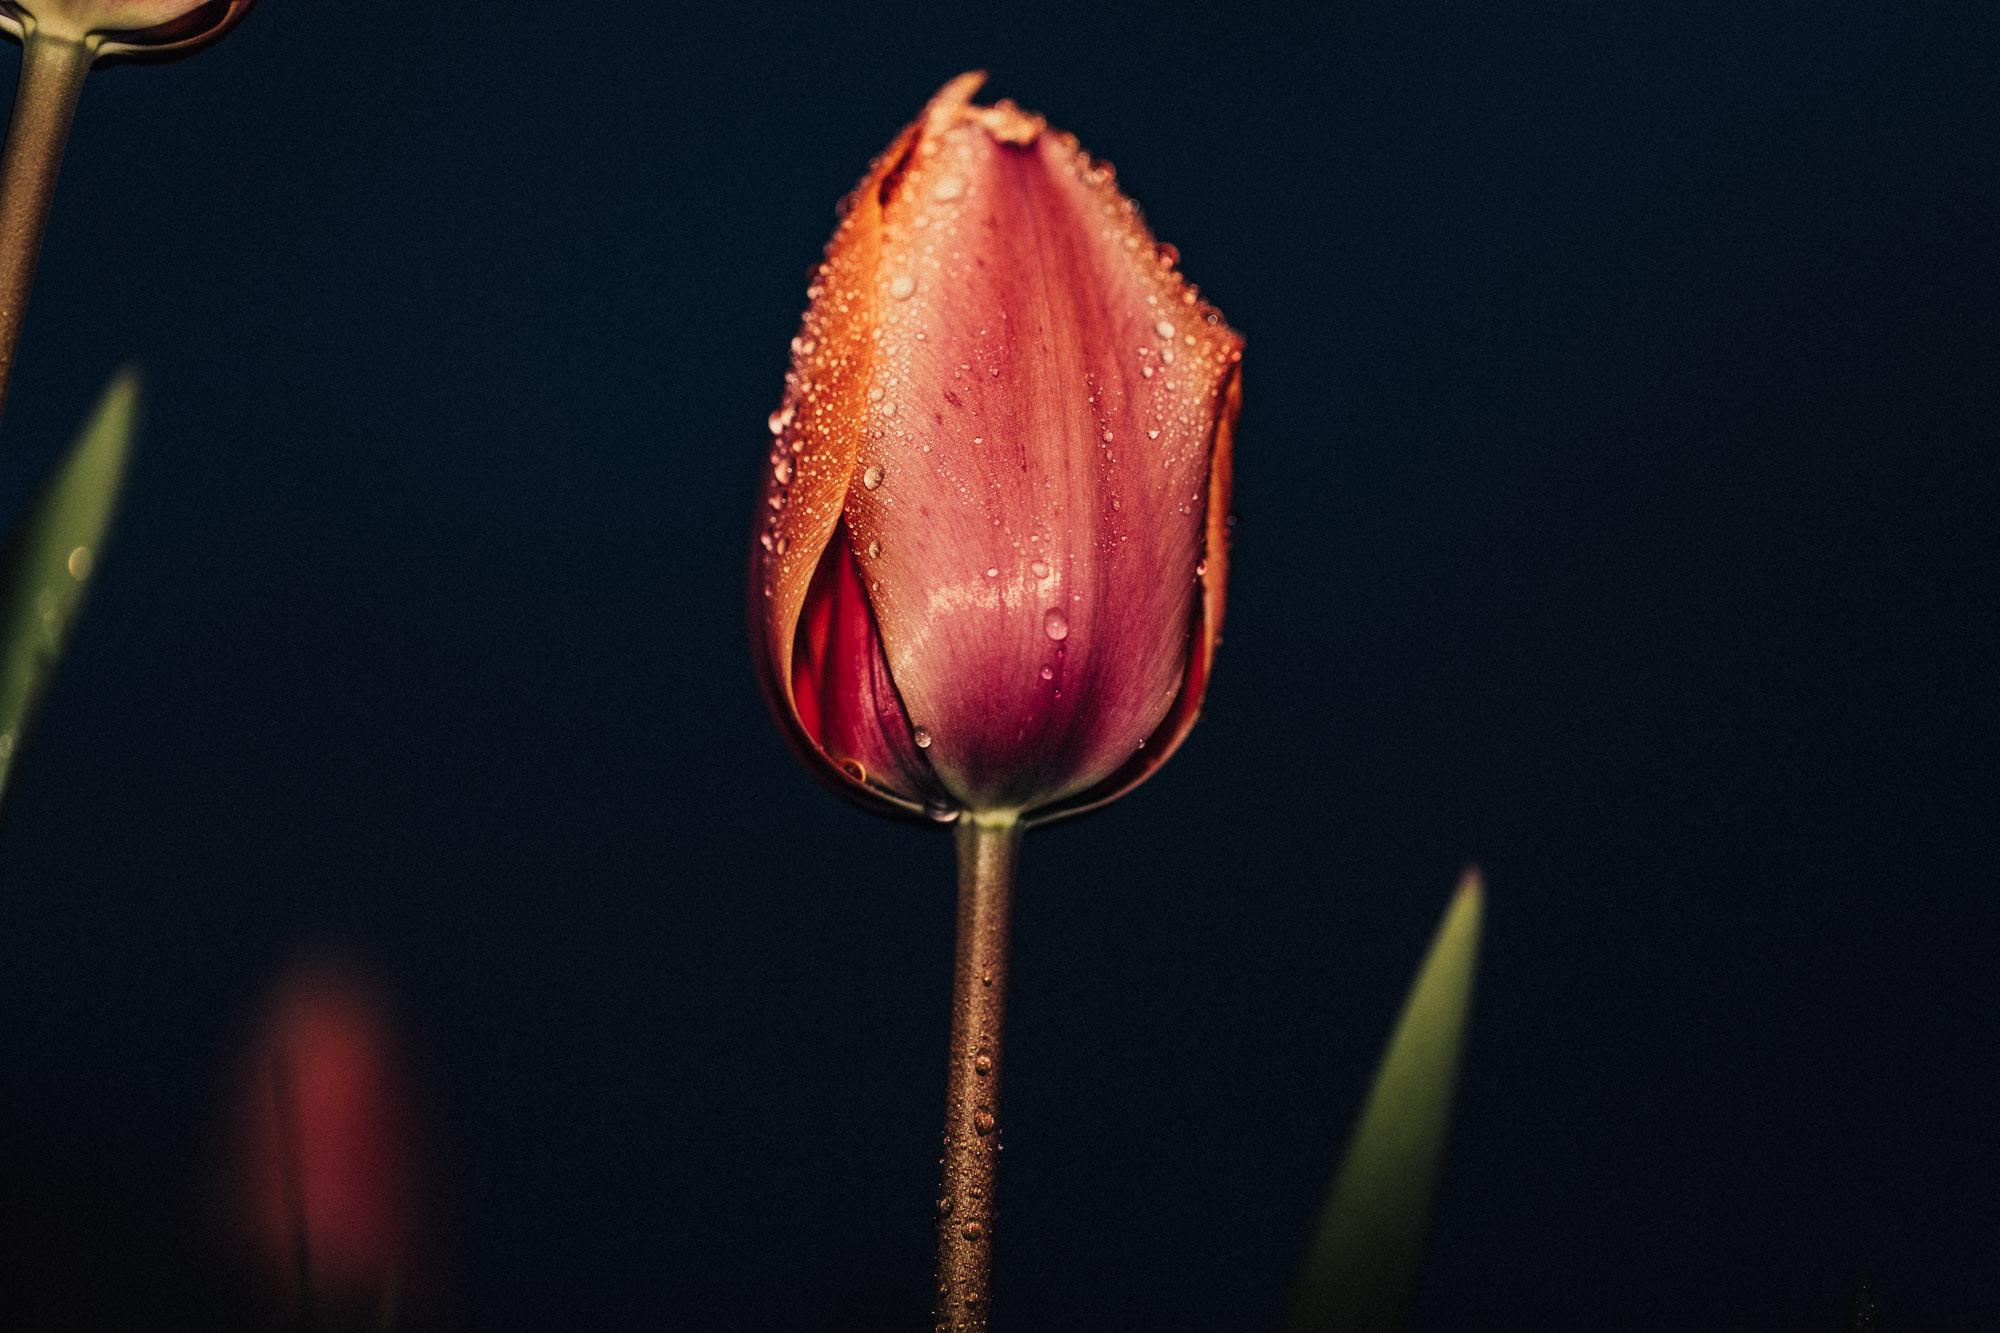 20180405_tulips_0048.jpg